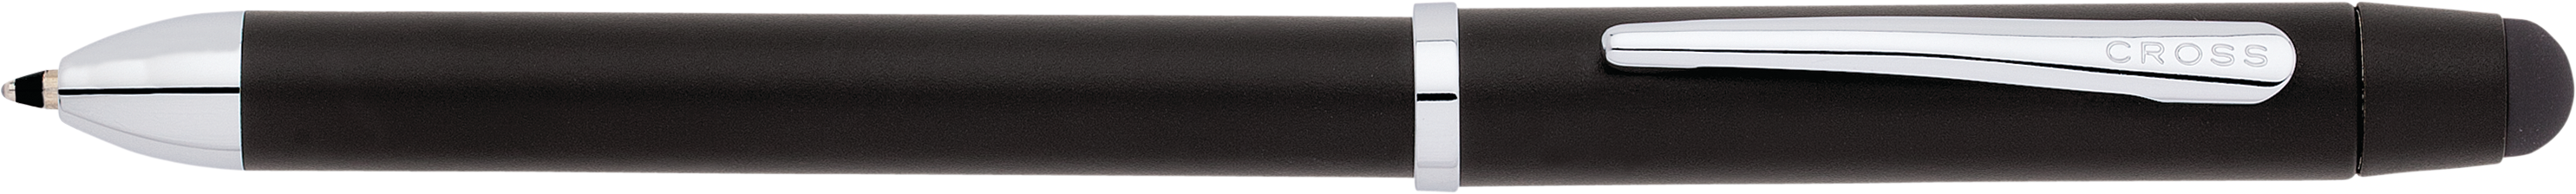 Tech3+ Satin Black Multifunction Pen